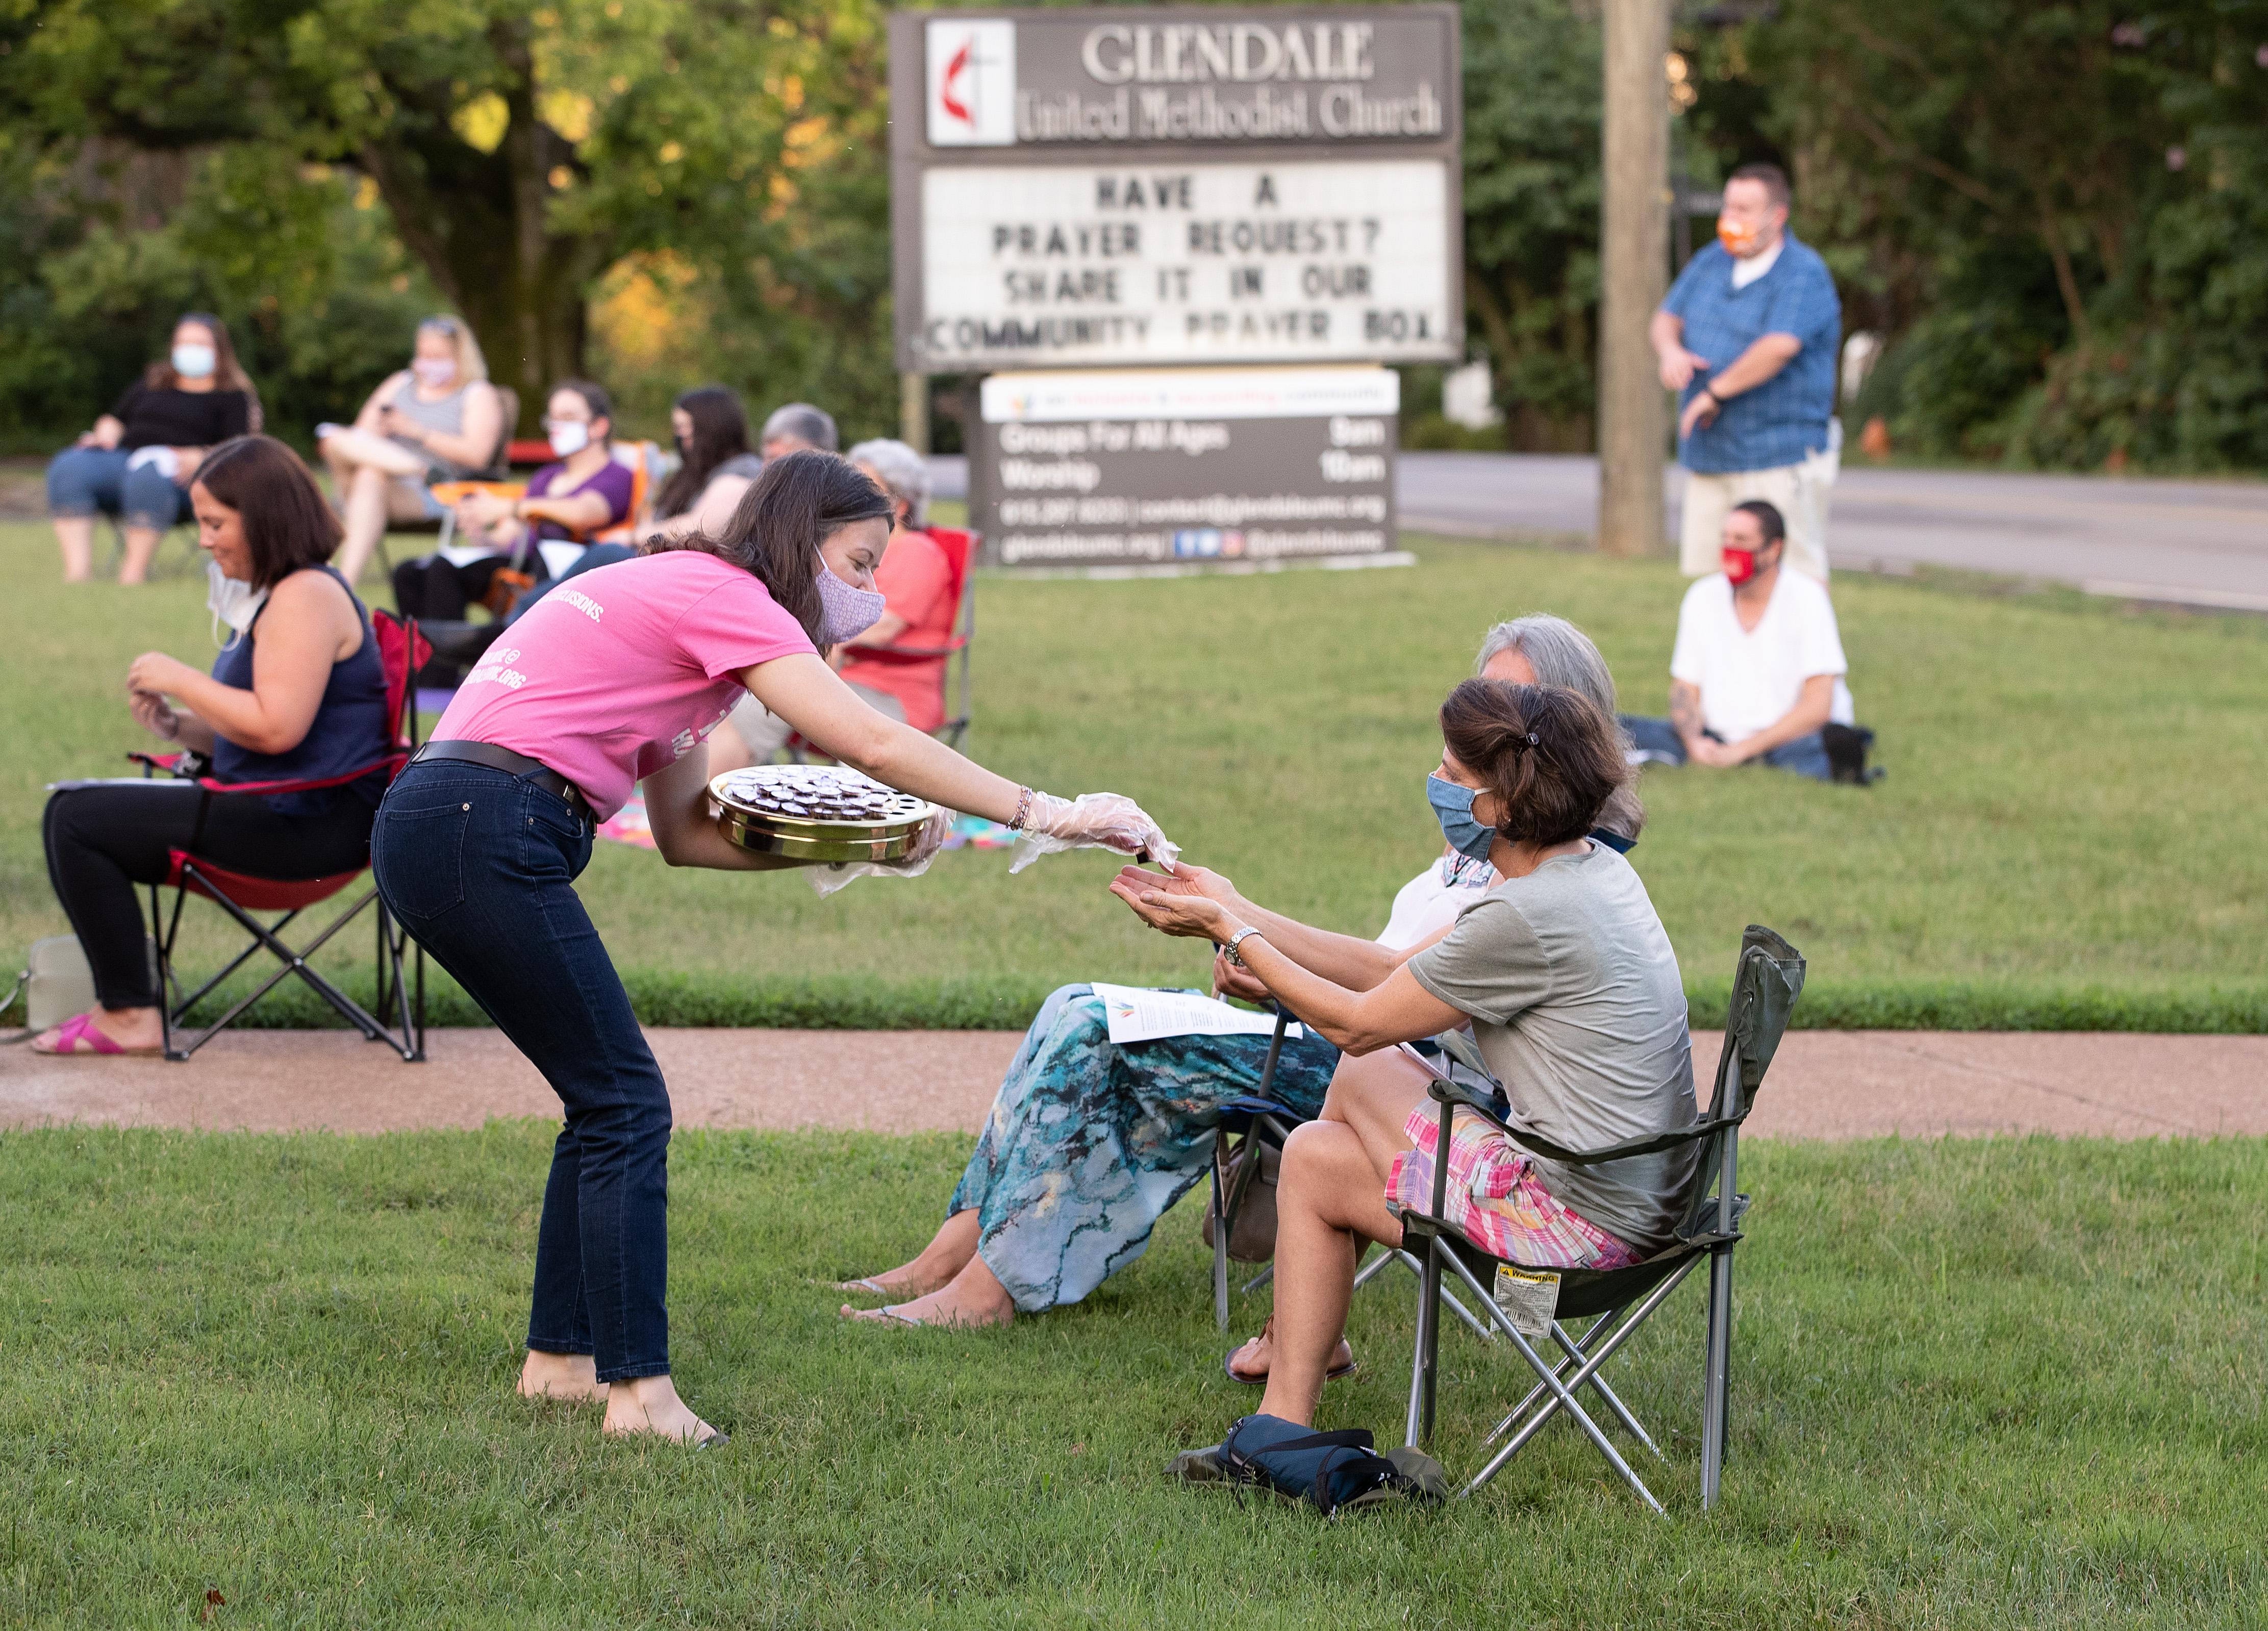 Laura Kreiselmaier serves Holy Communion during an outdoor worship service at Glendale United Methodist Church in Nashville, Tenn., July 26, 2020. UM News.